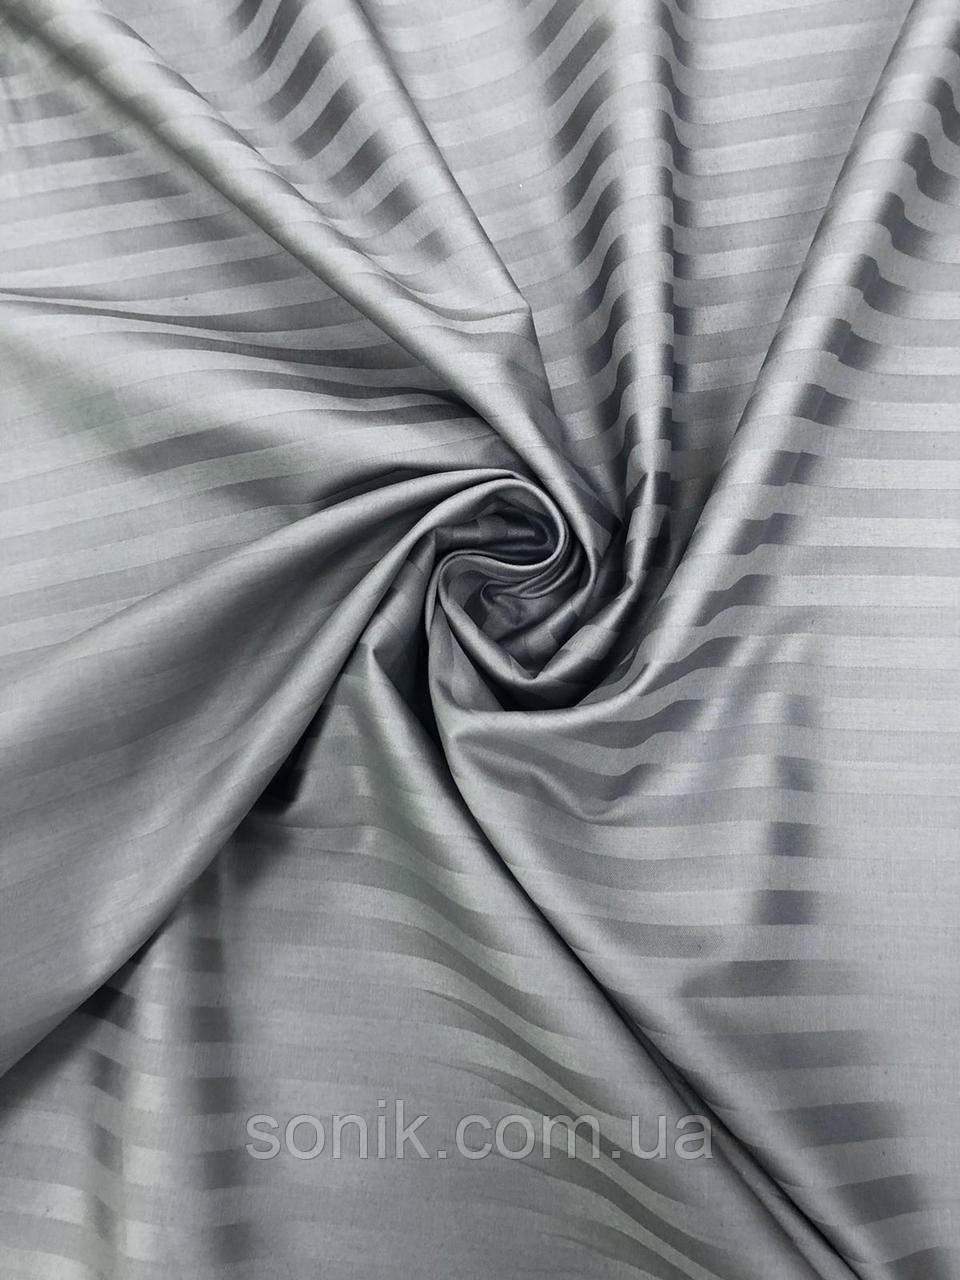 Сатин страйп 1/1 тёмно- серый 220 см